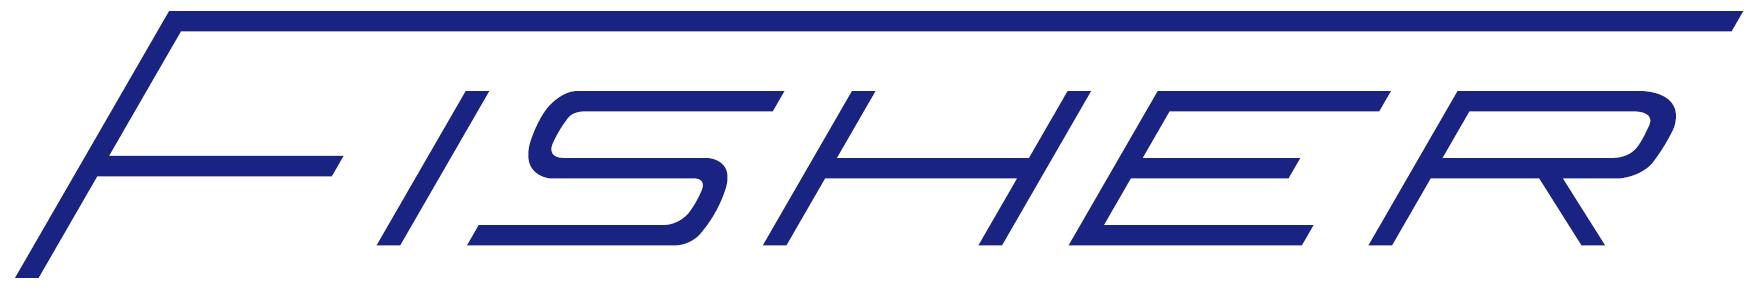 Kitchen Faucet American Standard Logo